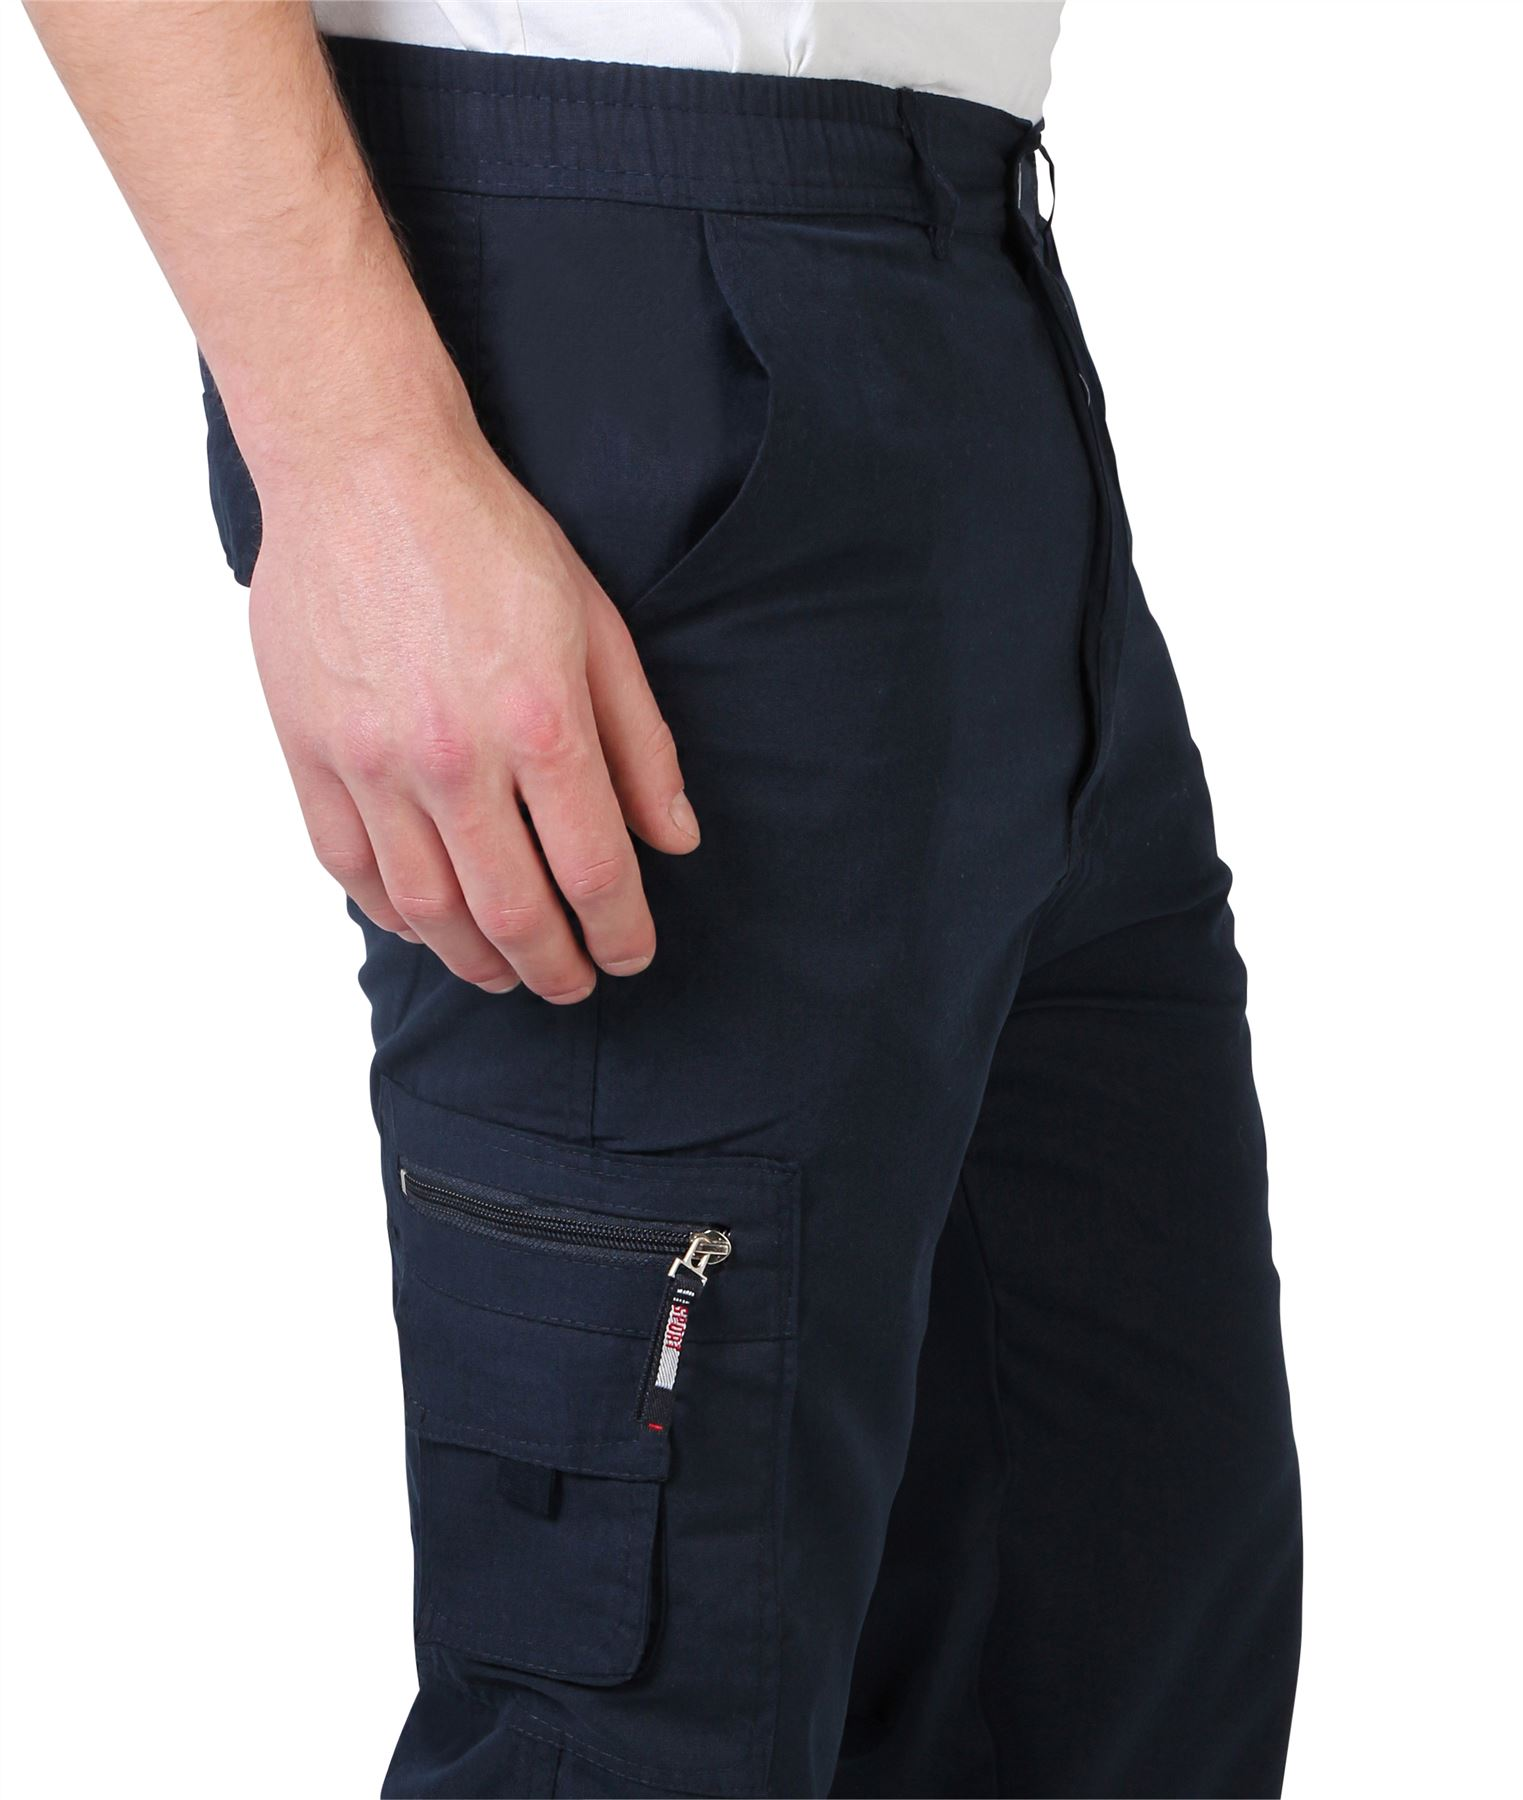 Pantalones-Hombre-Estilo-Cargo-Militar-Combate-Multibolsillos-Casual miniatura 3